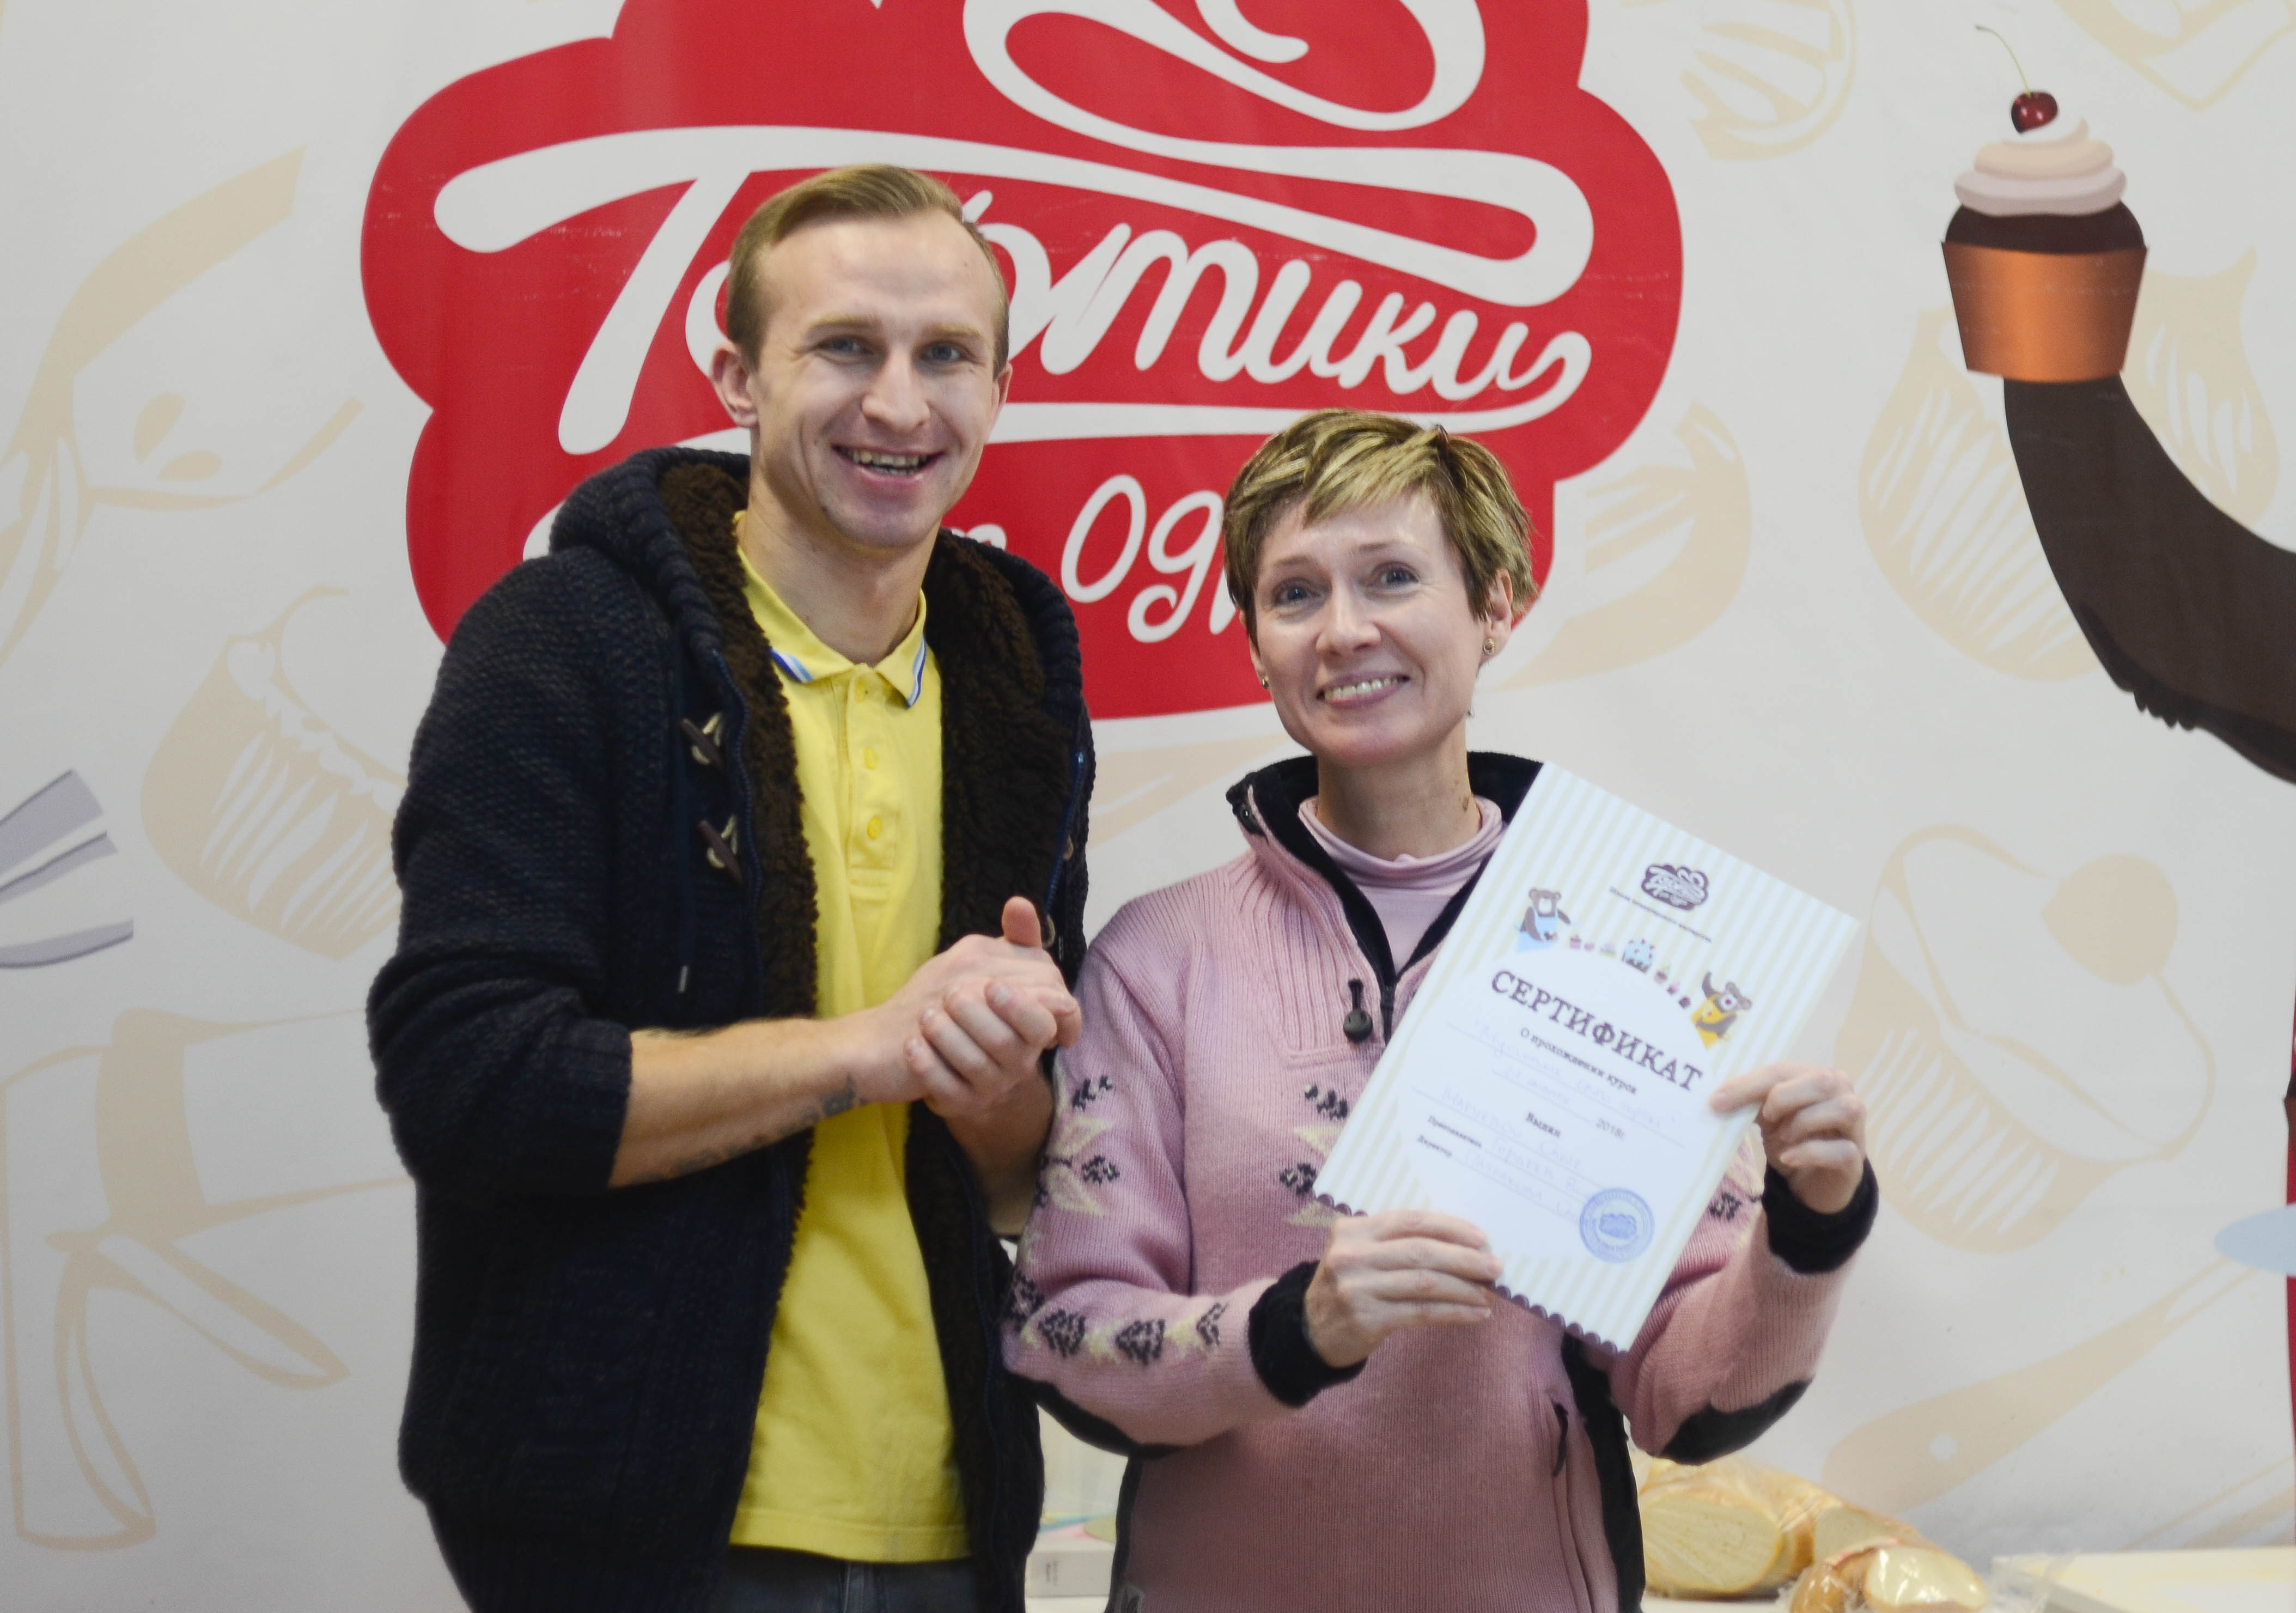 http://odry-school.ru/images/upload/DSC_0175.jpg